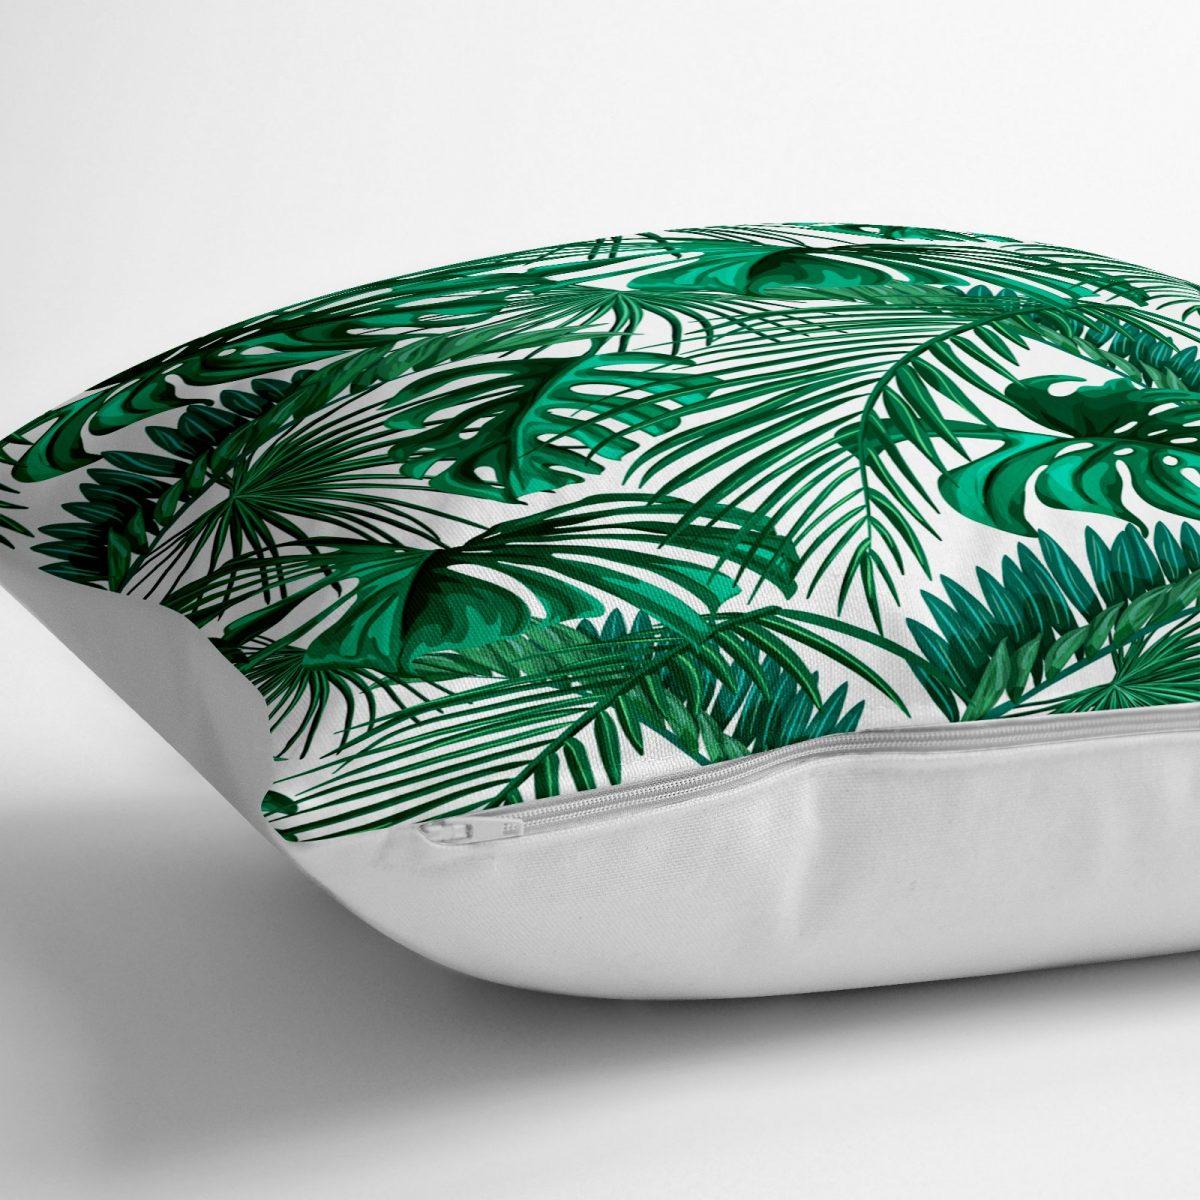 Mint Yeşili Kavaniçe Motifli Dekoratif Yer Minderi - 70 x 70 cm Realhomes